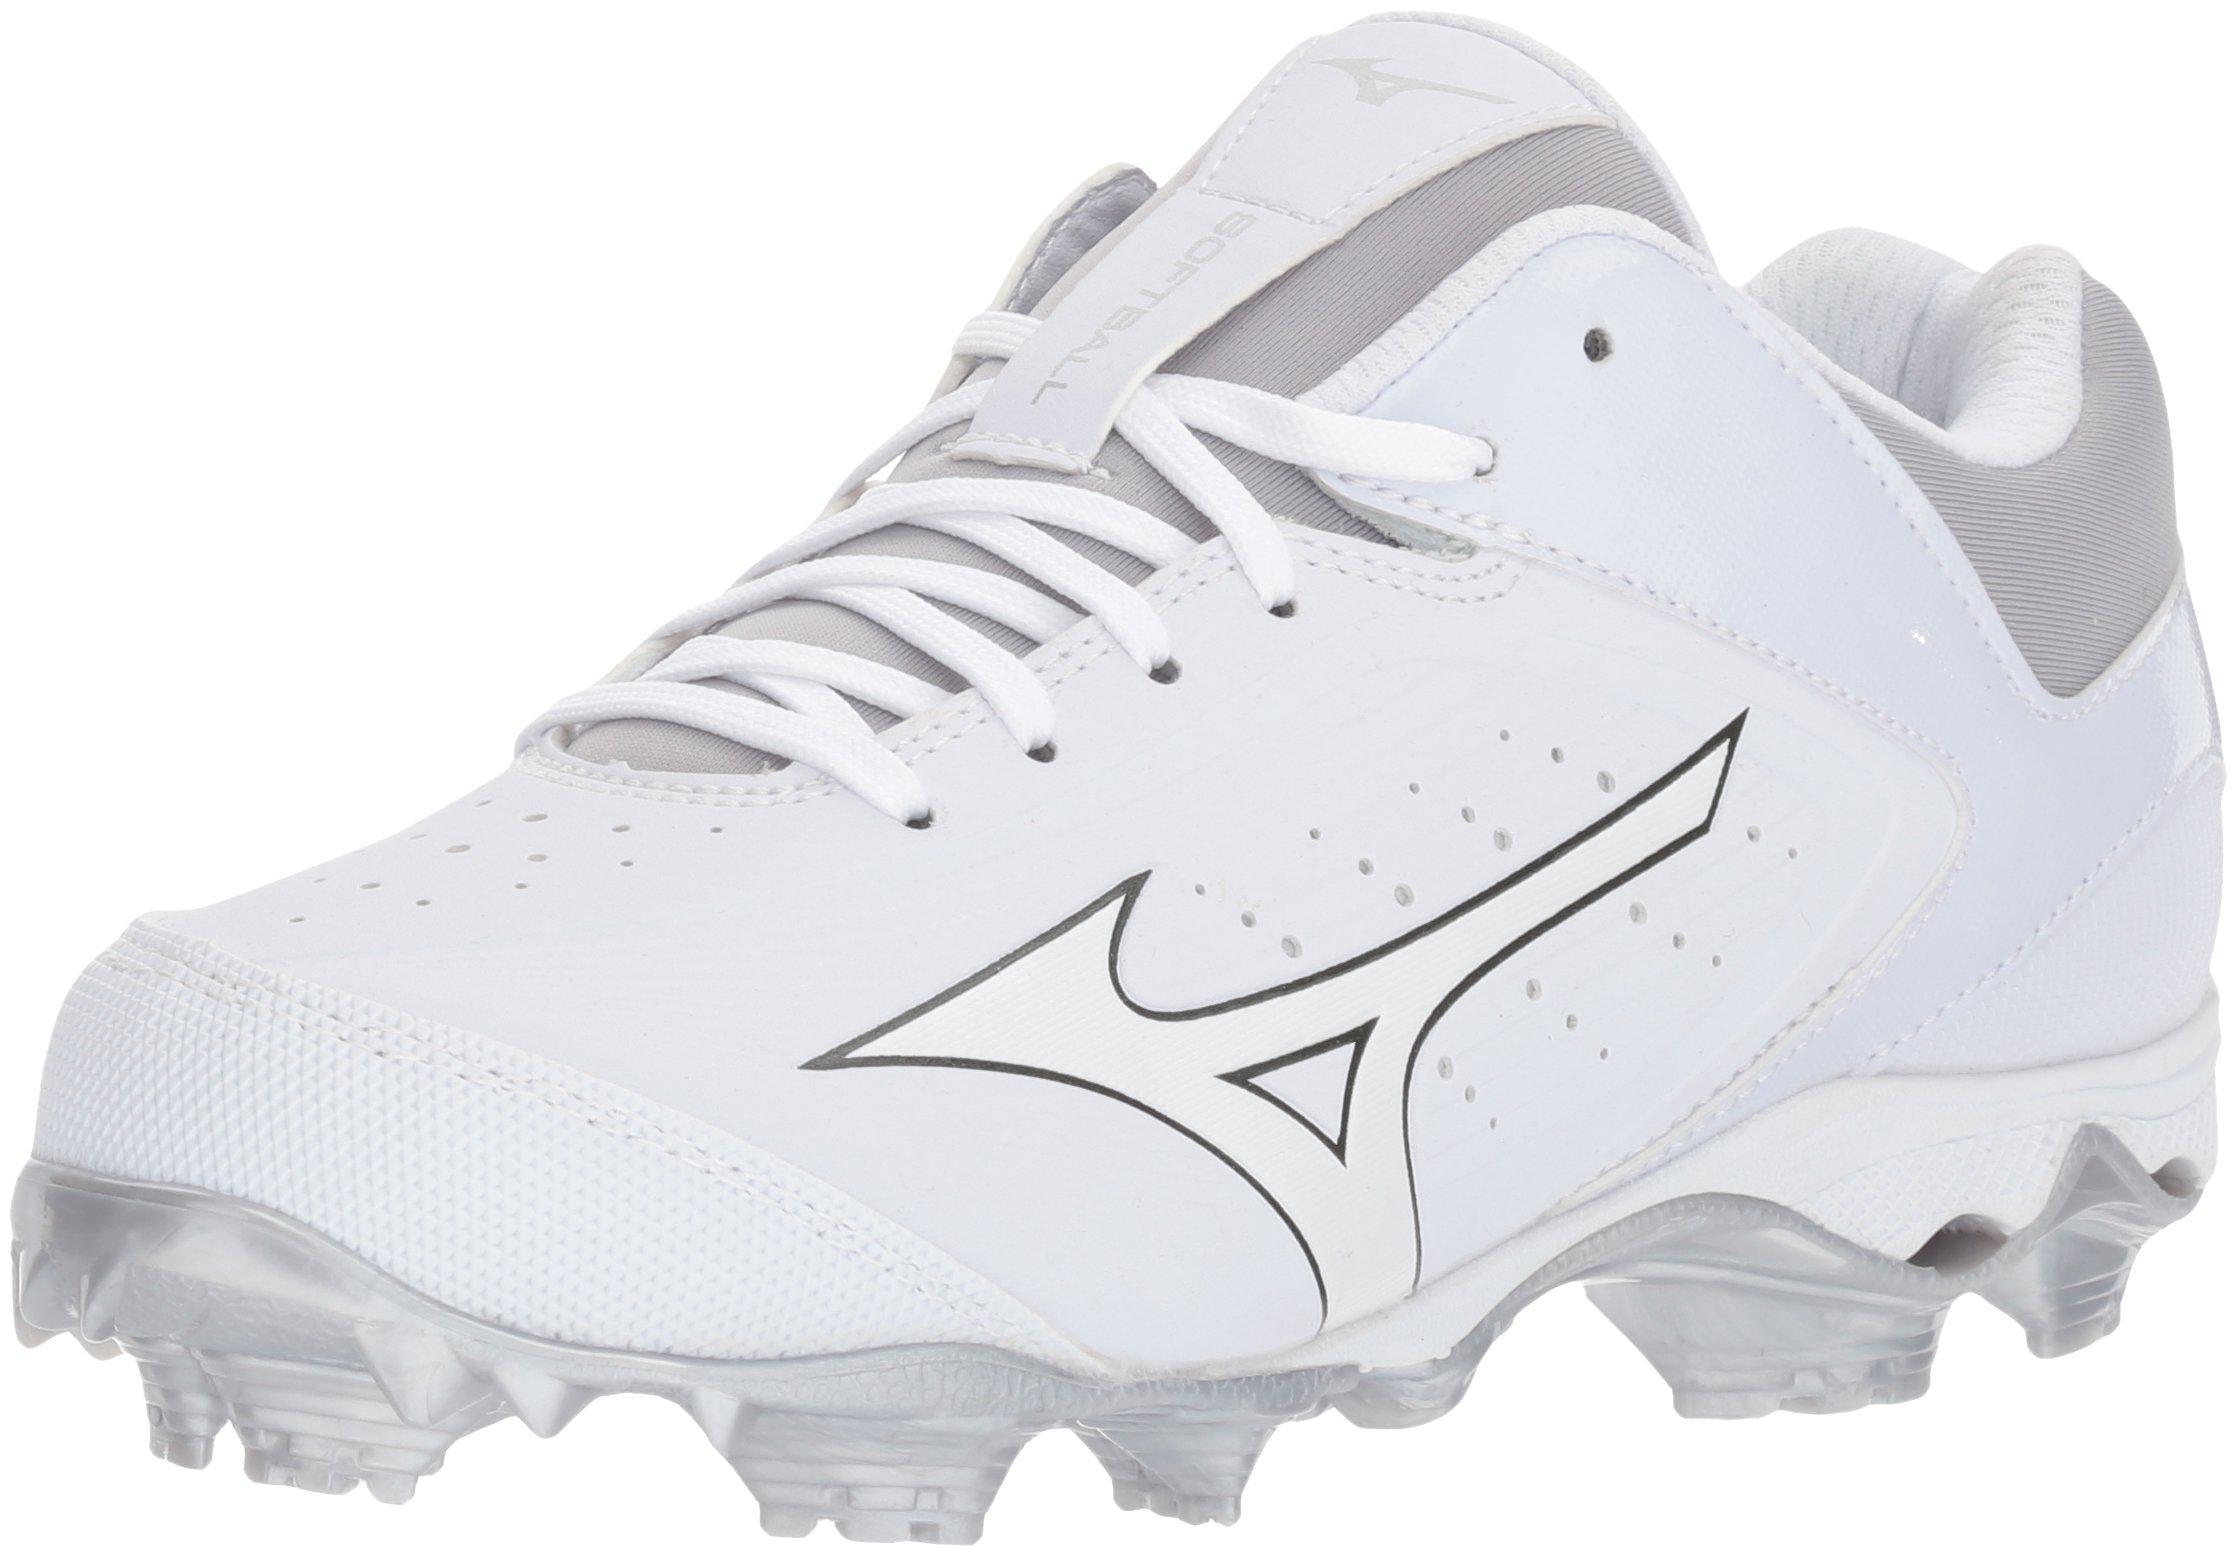 96012eff1ed8 Mizuno (MIZD9) 9-Spike Advanced Finch Elite 3 Womens Fastpitch Softball  Cleat Shoe